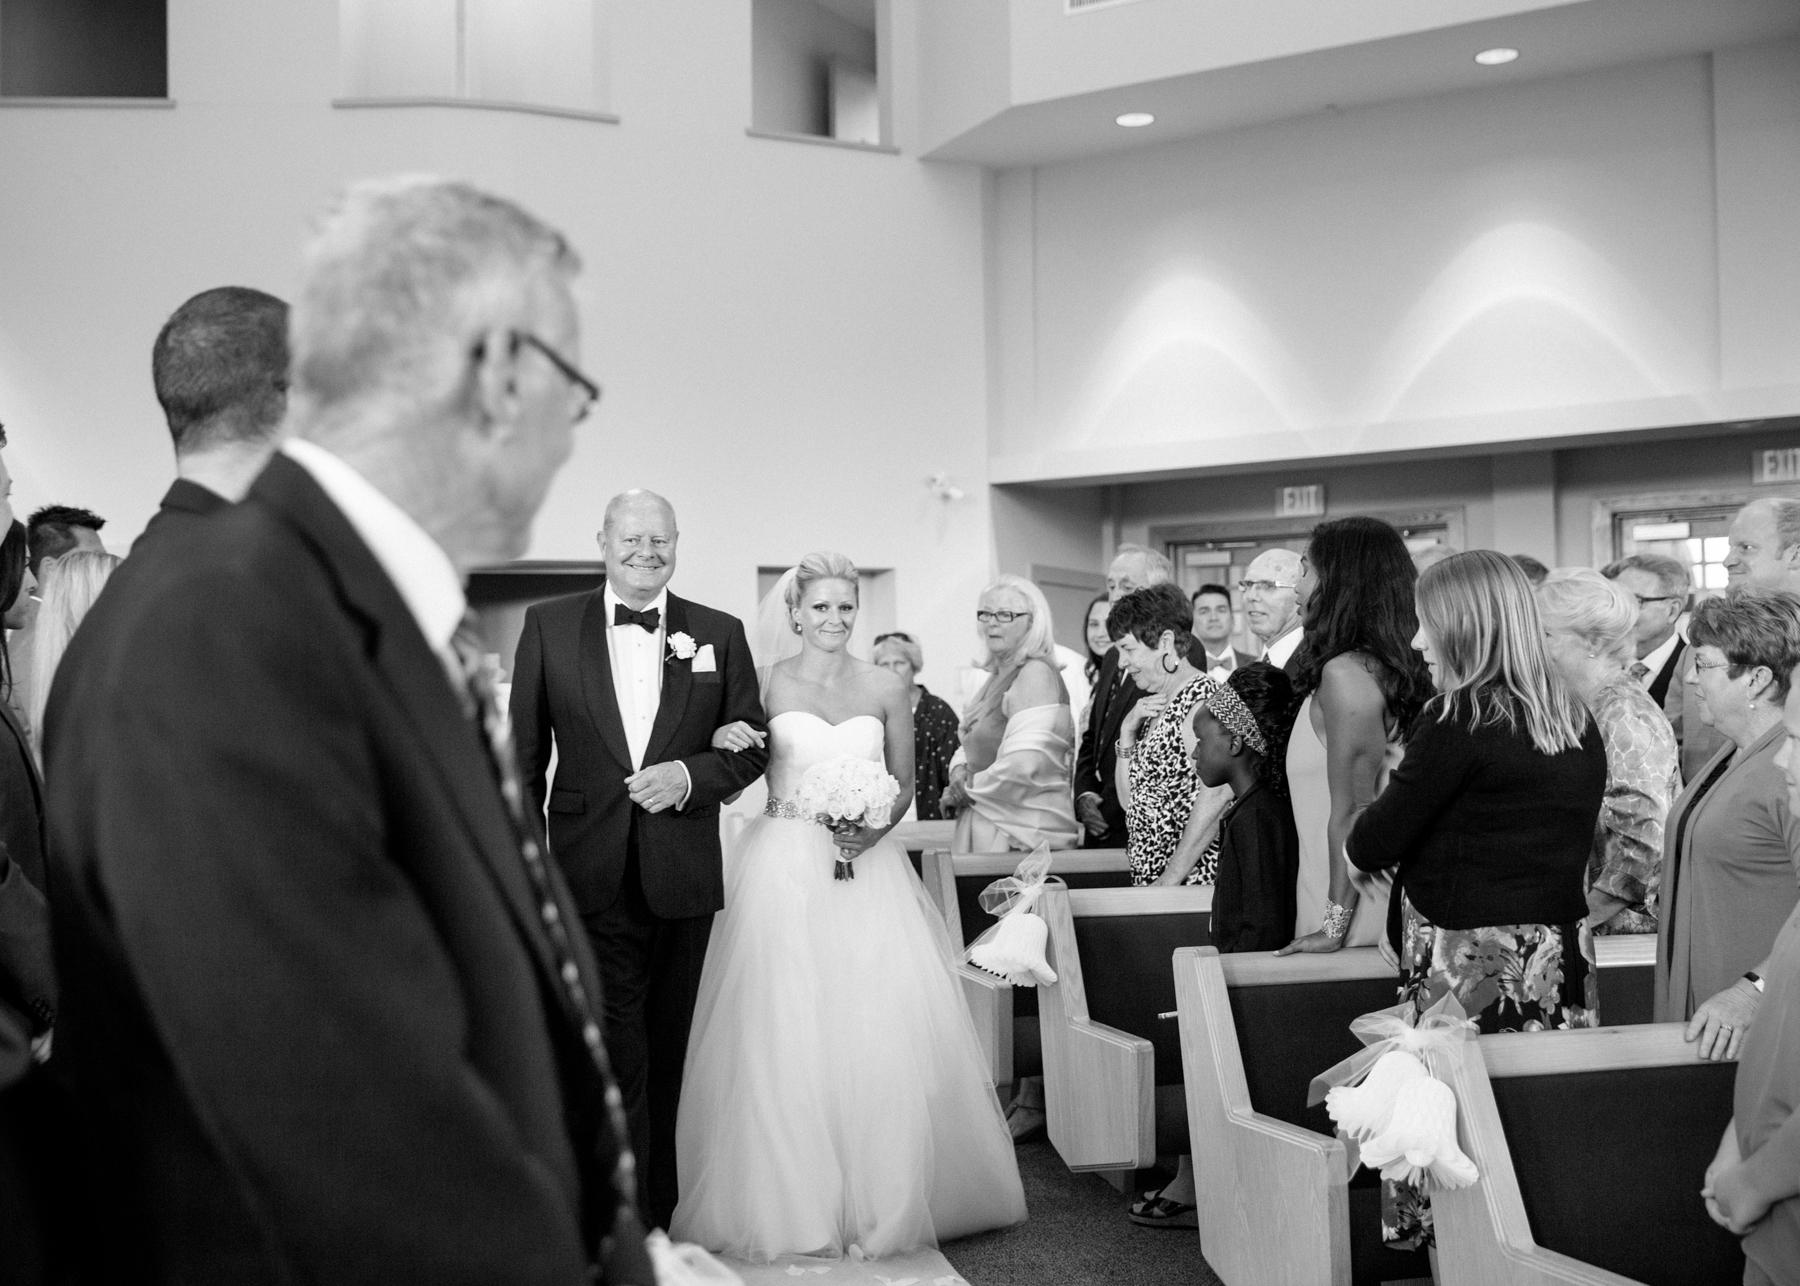 kaoverii_silva_photographer_via-herafilms_kelly_mike_wedding-9.jpg